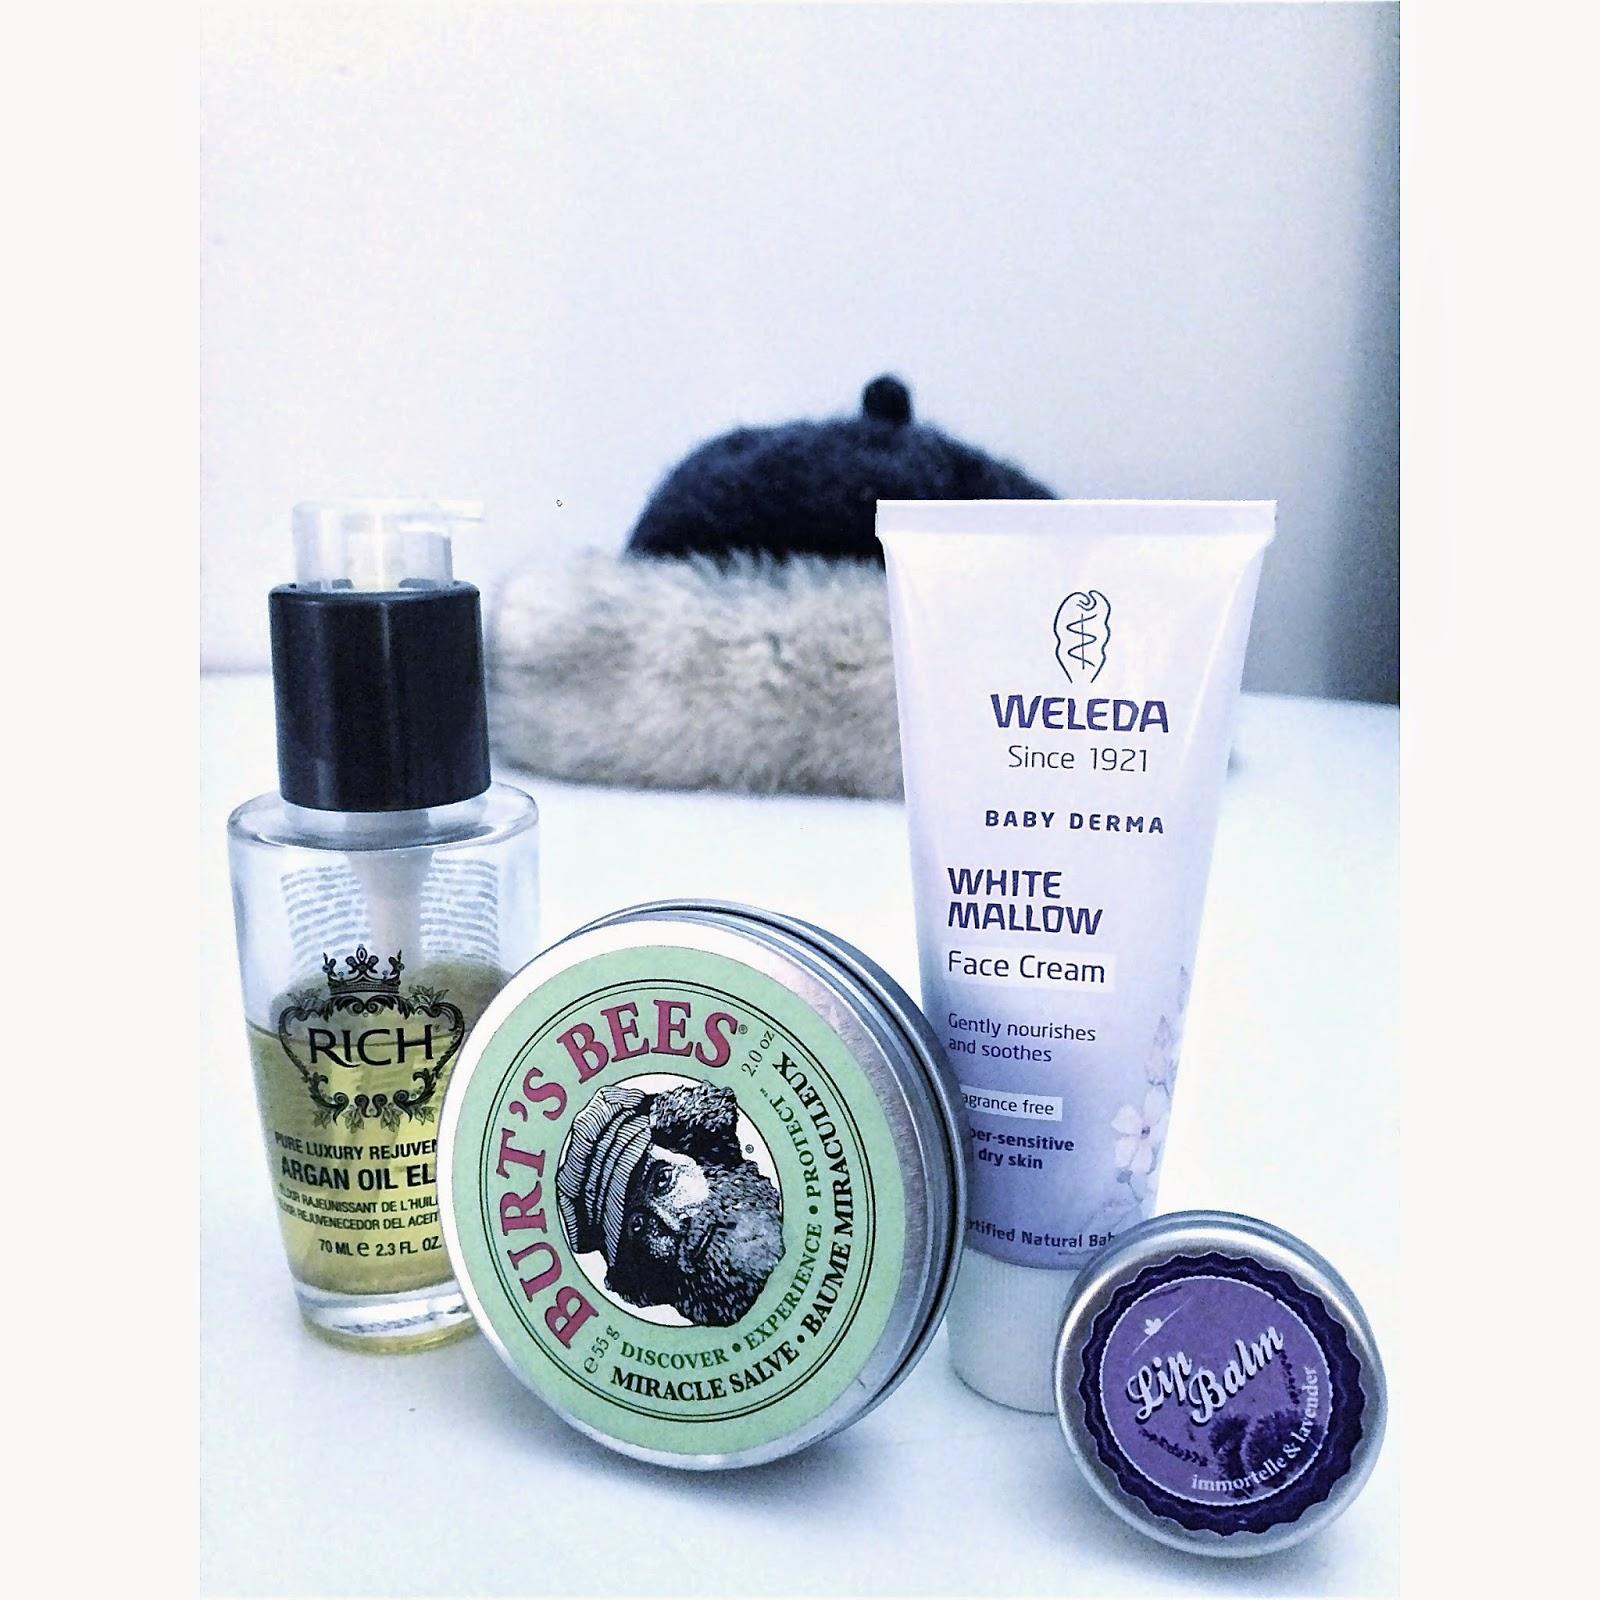 weleda, white mallow, rich argan oil, burts bees, miracle salve, eko, ekokosmetik, naturkosmetik